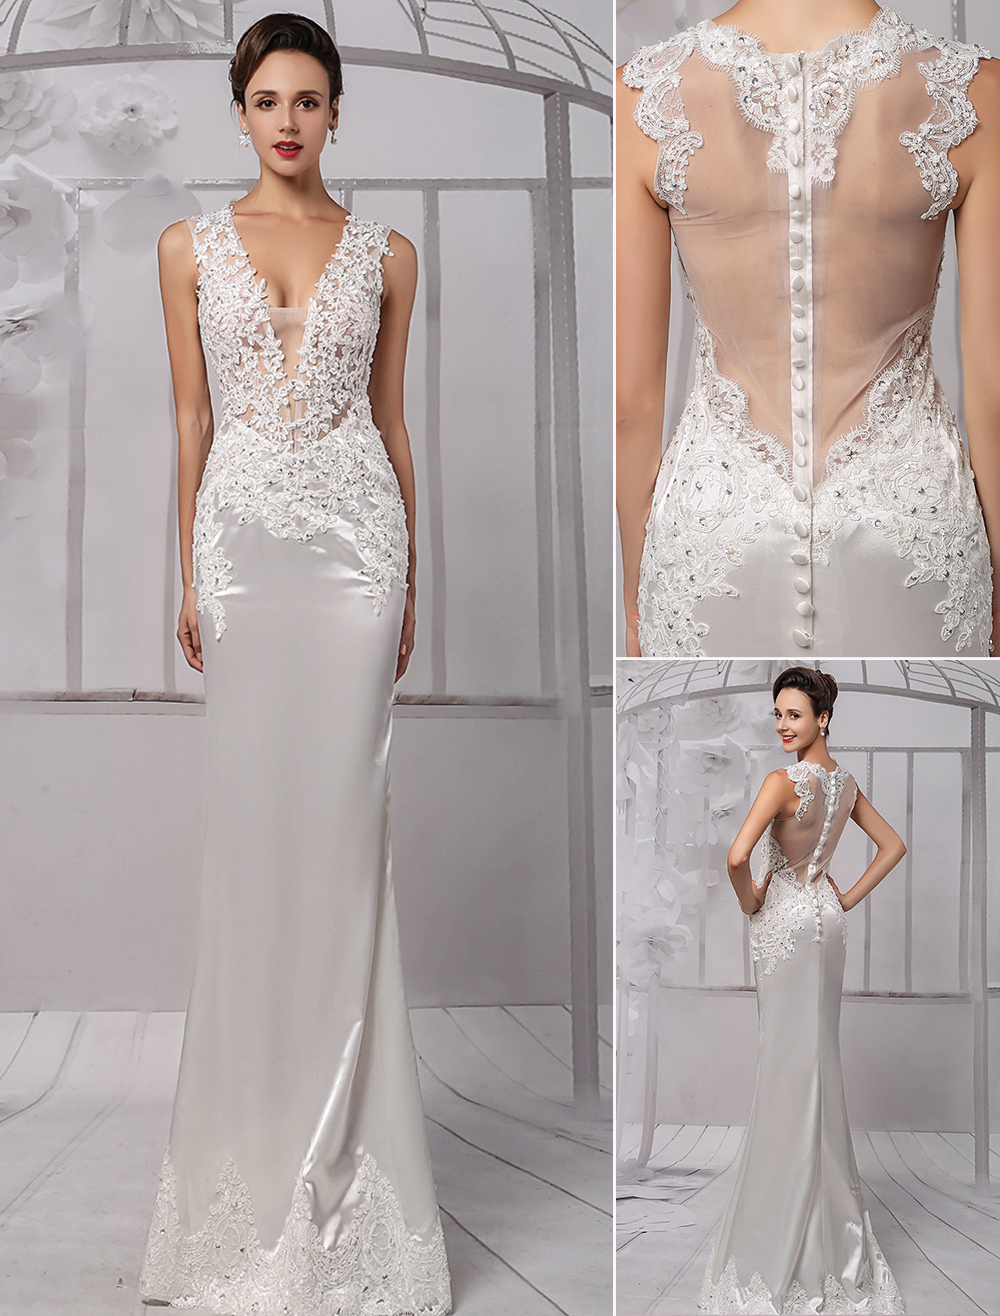 Sexy Lace Deep V-Neck Beaded Sheath/Column Illusion Back Bridal Gown Milanoo